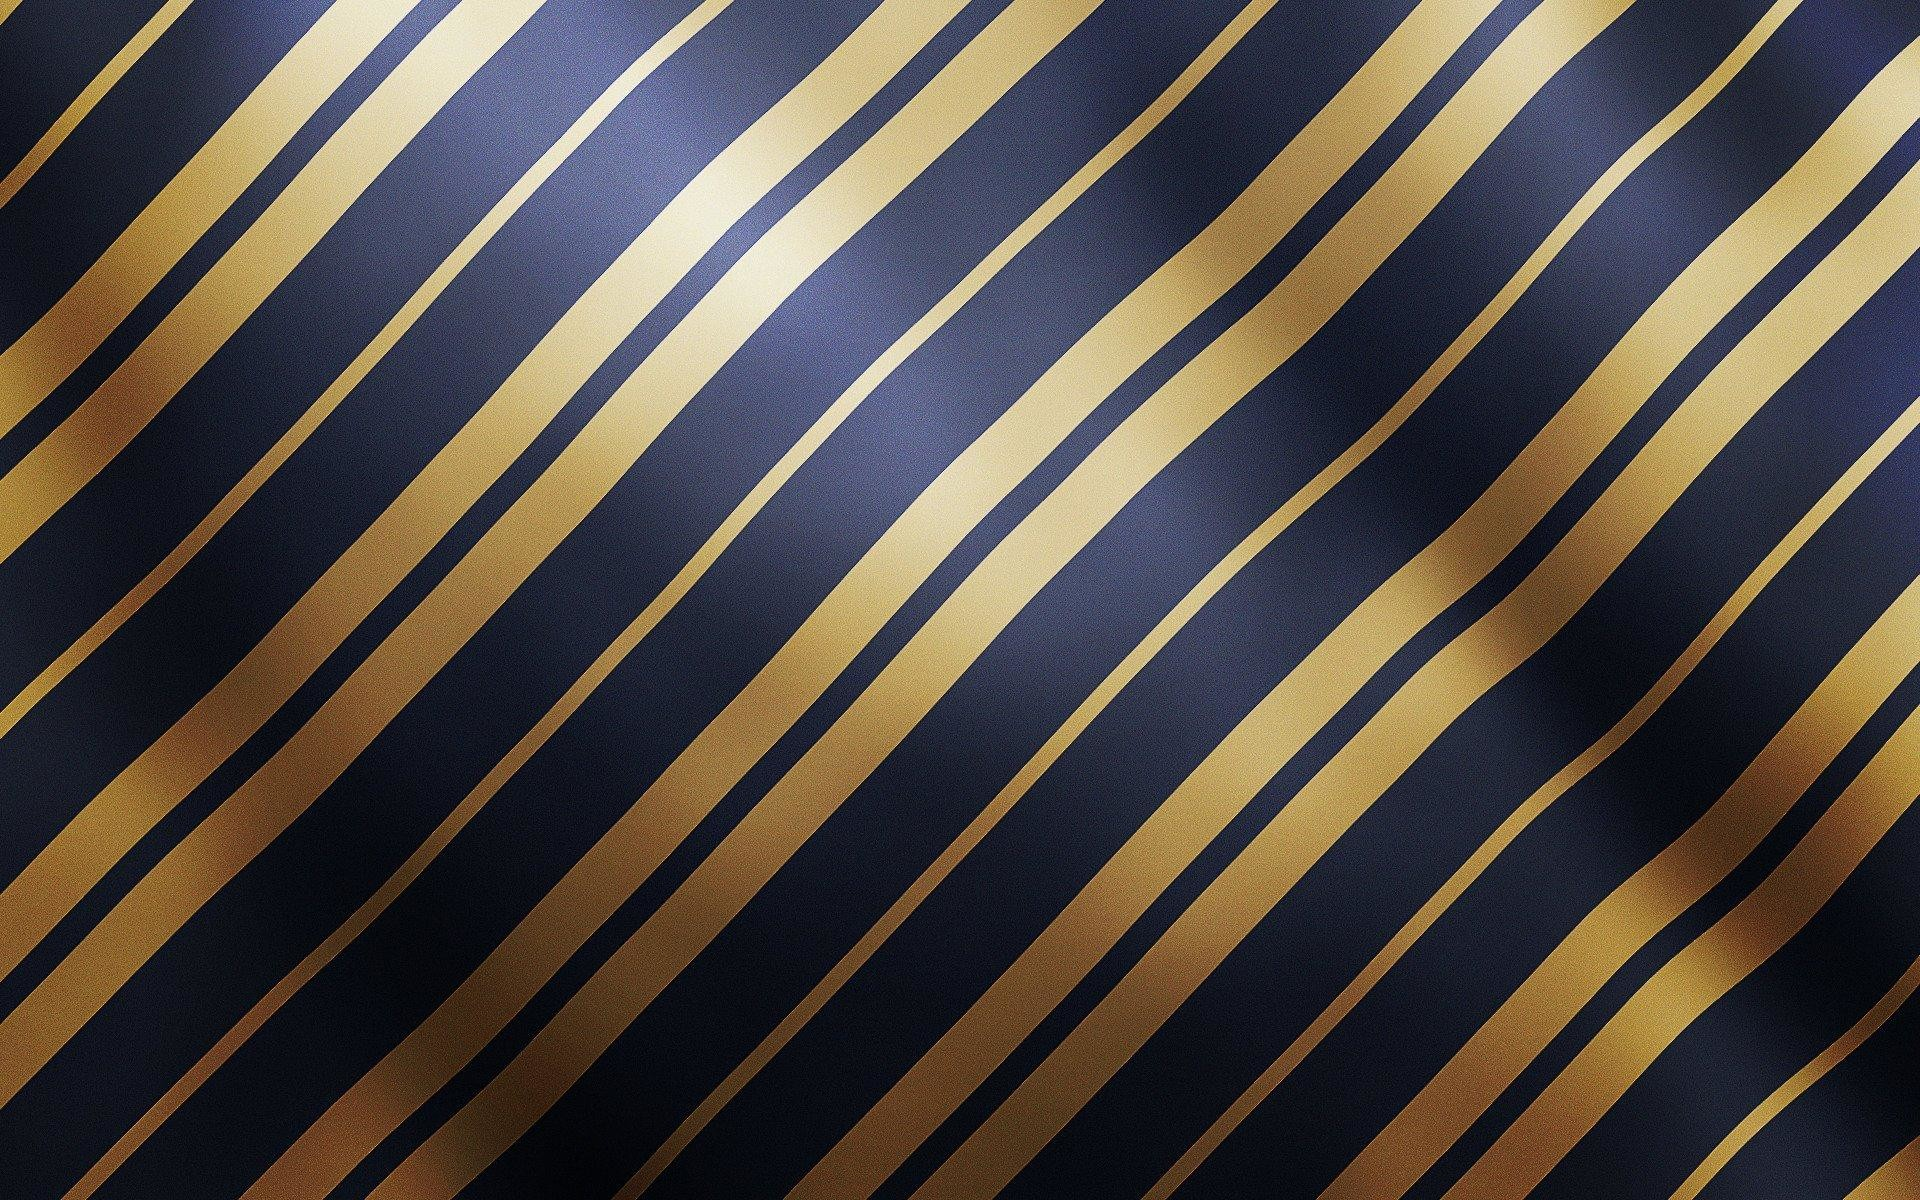 Royal Blue and Gold Wallpaper – WallpaperSafari